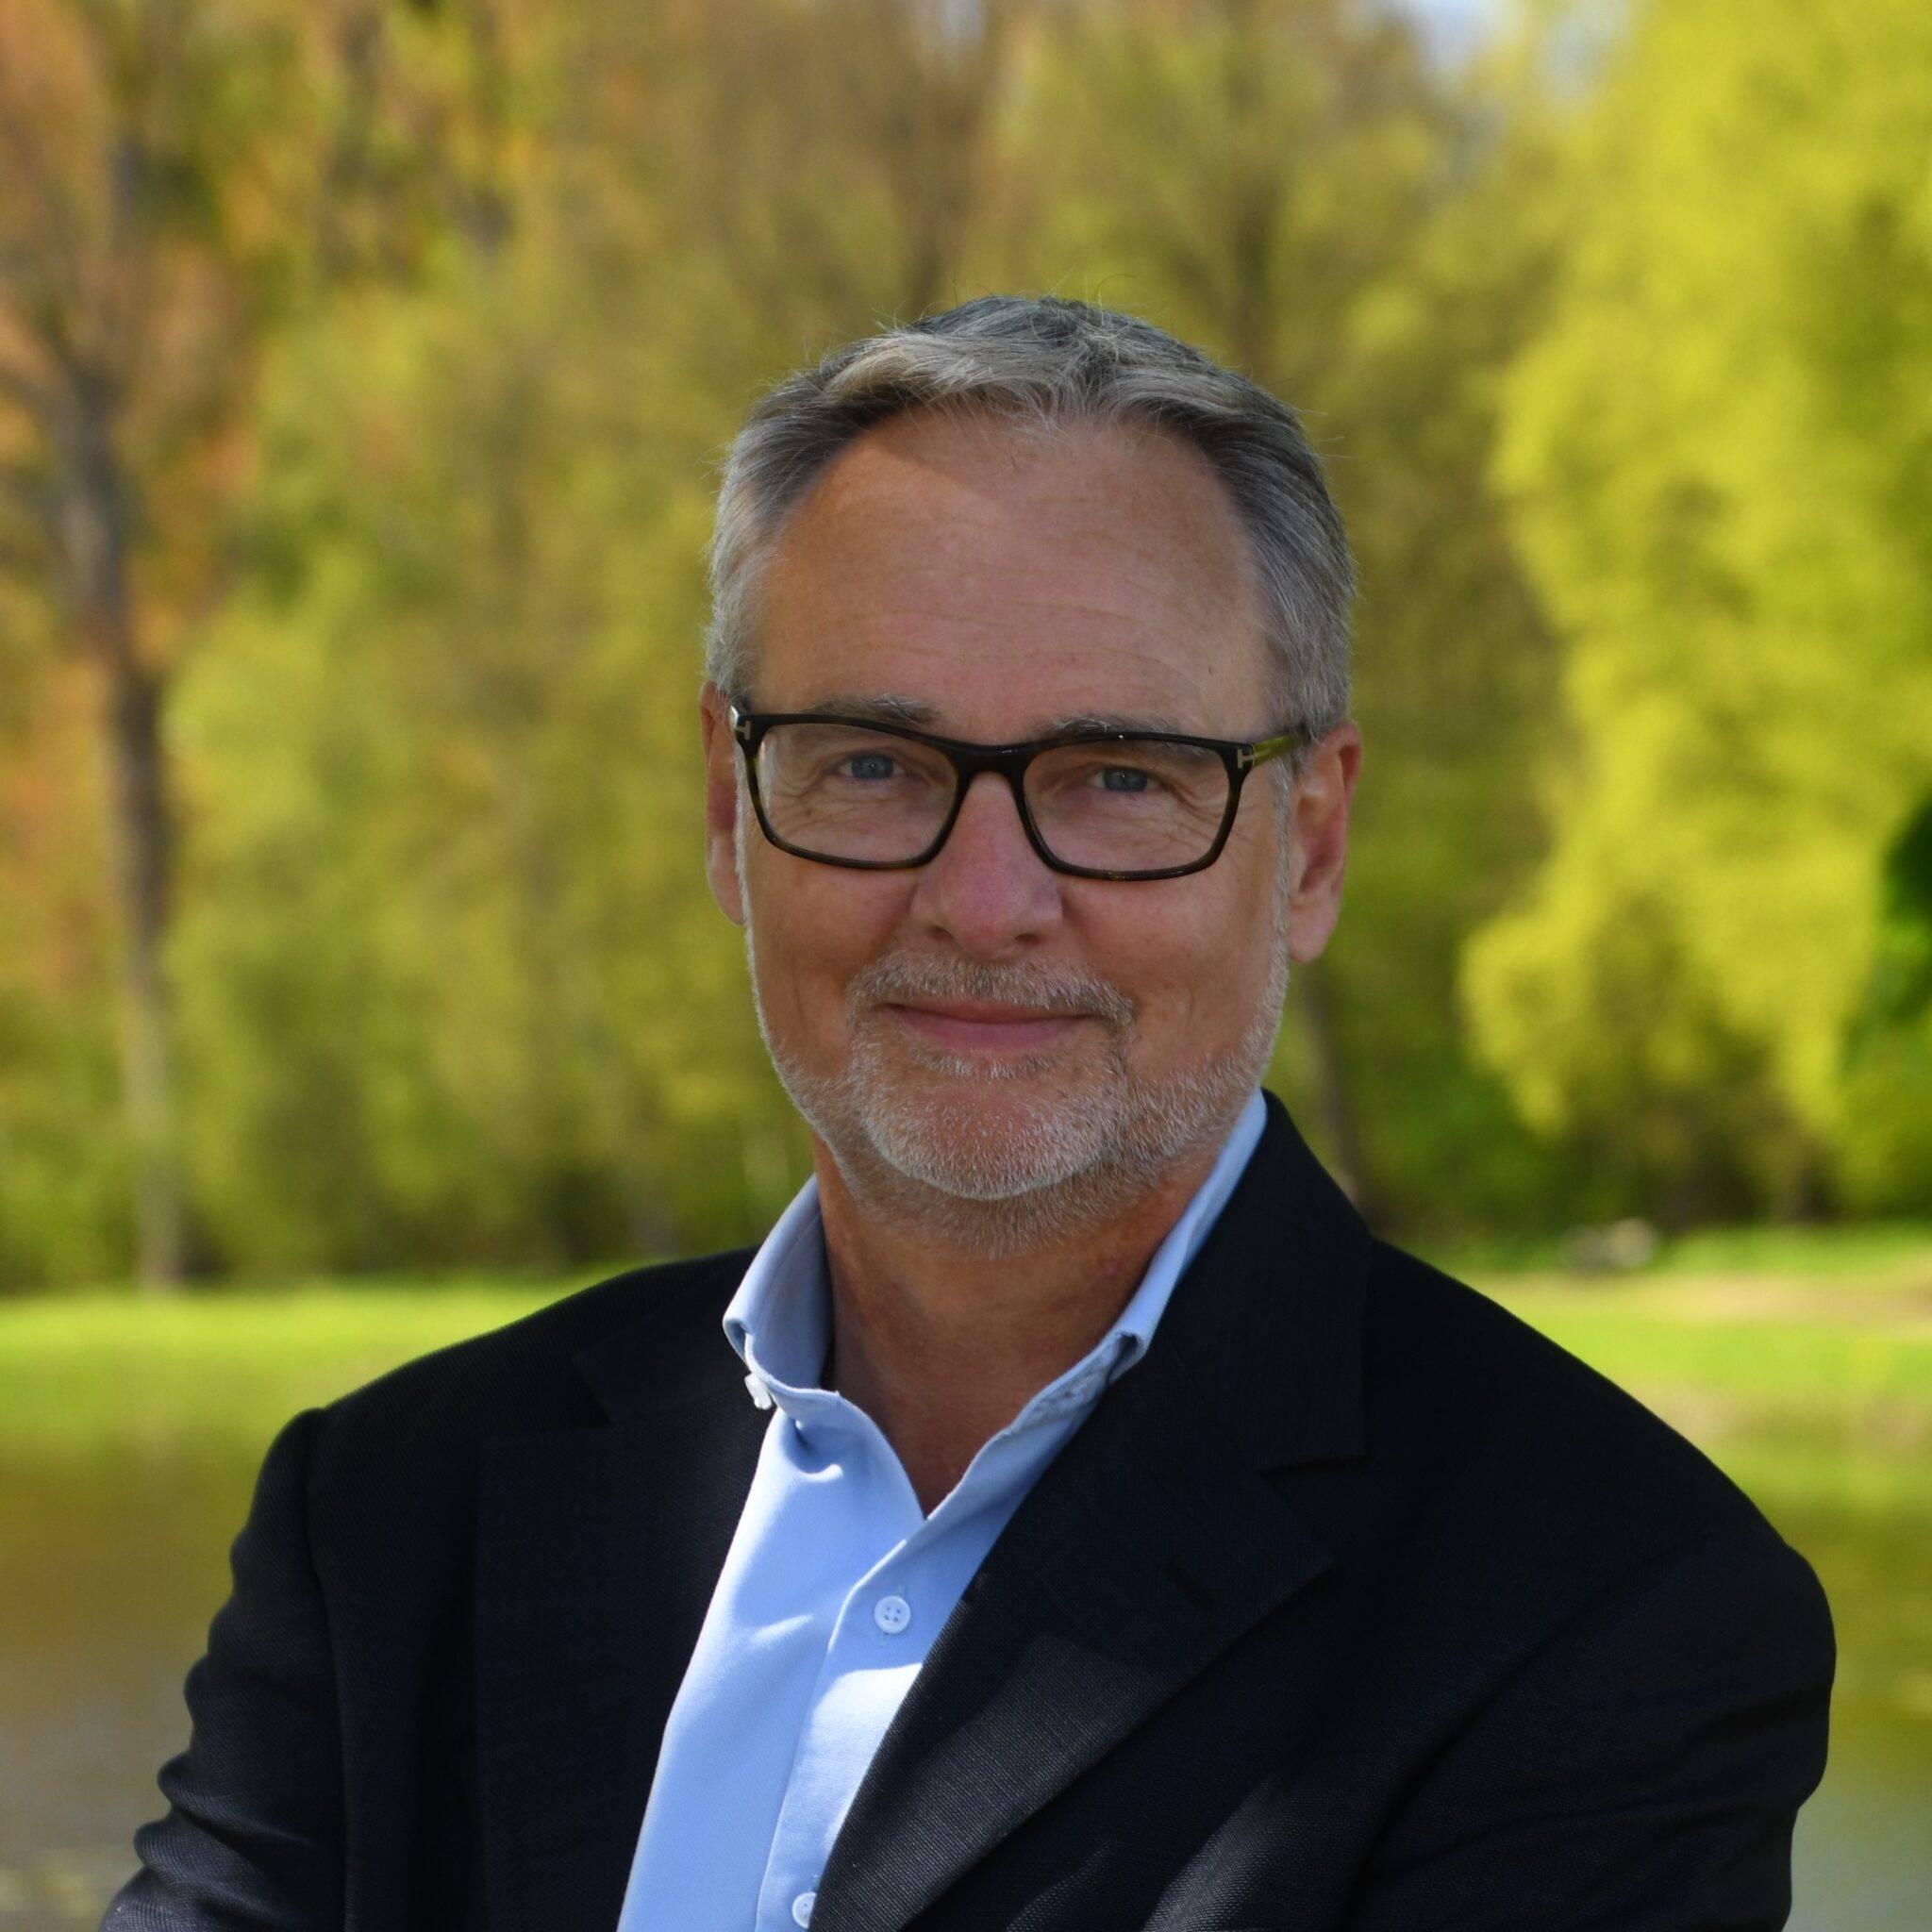 Michael S. Nielsen